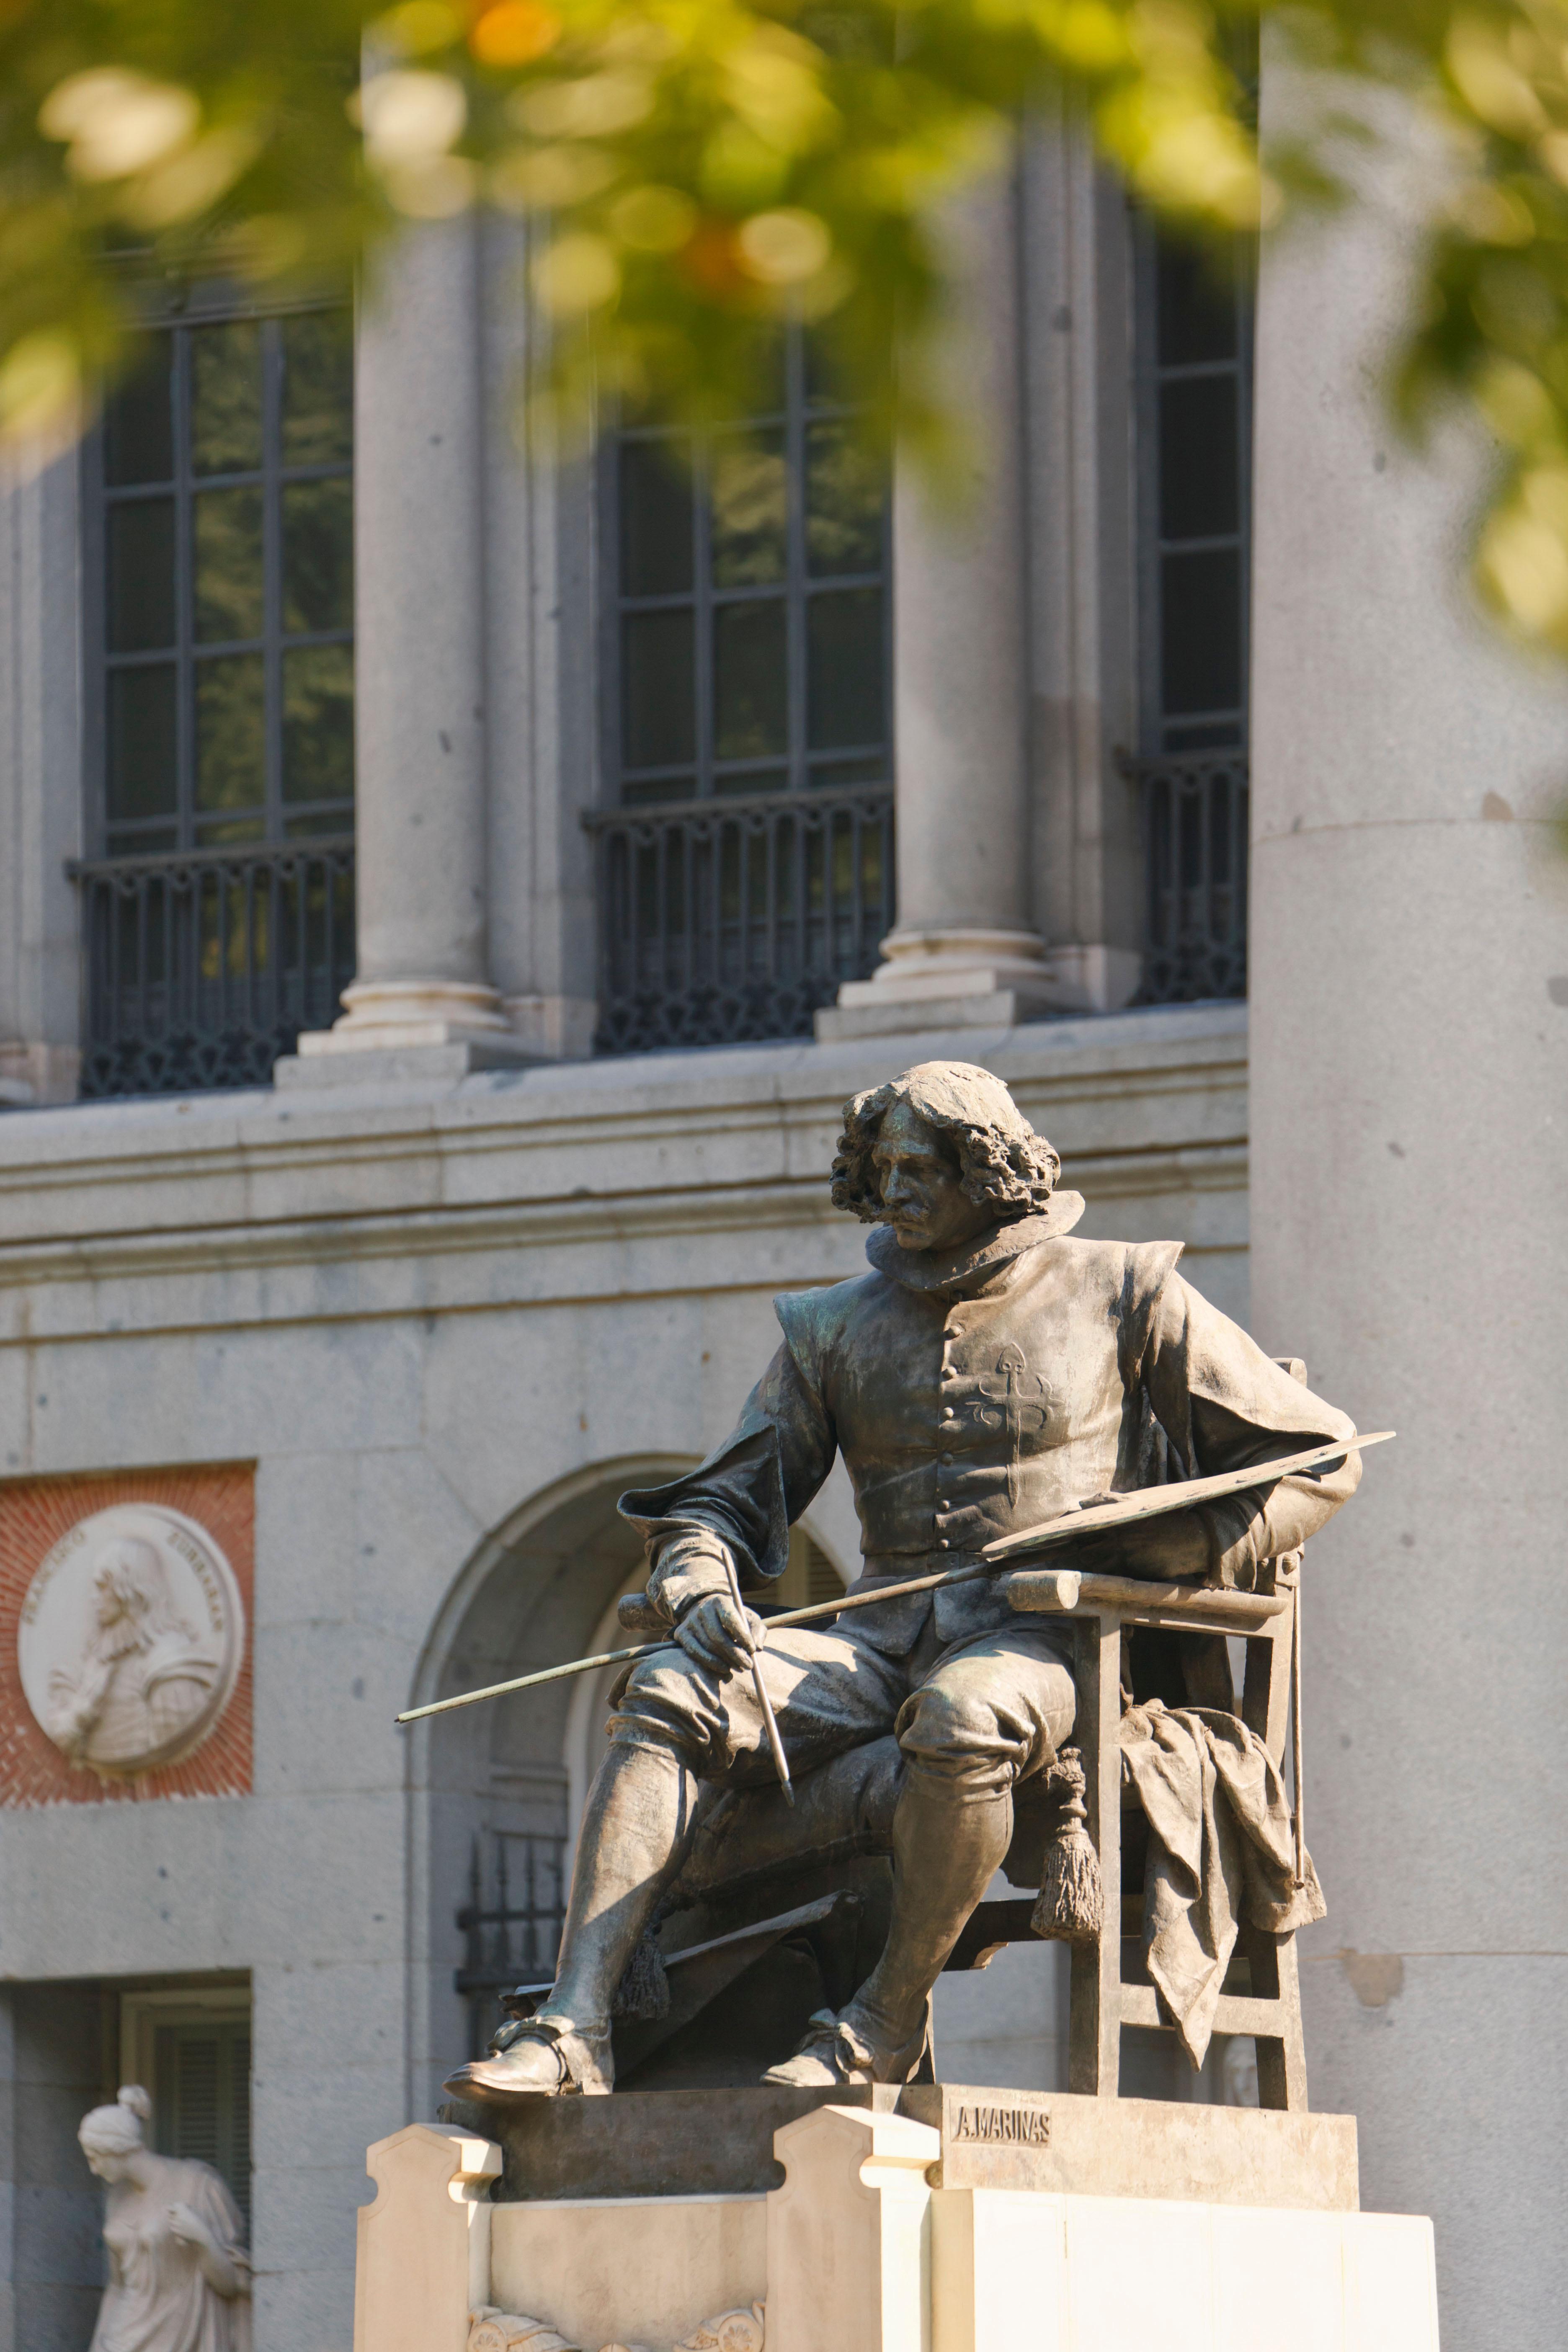 Madrid, Spain. Statue of Spanish artist Diego Velazquez outside the El Prado museum.